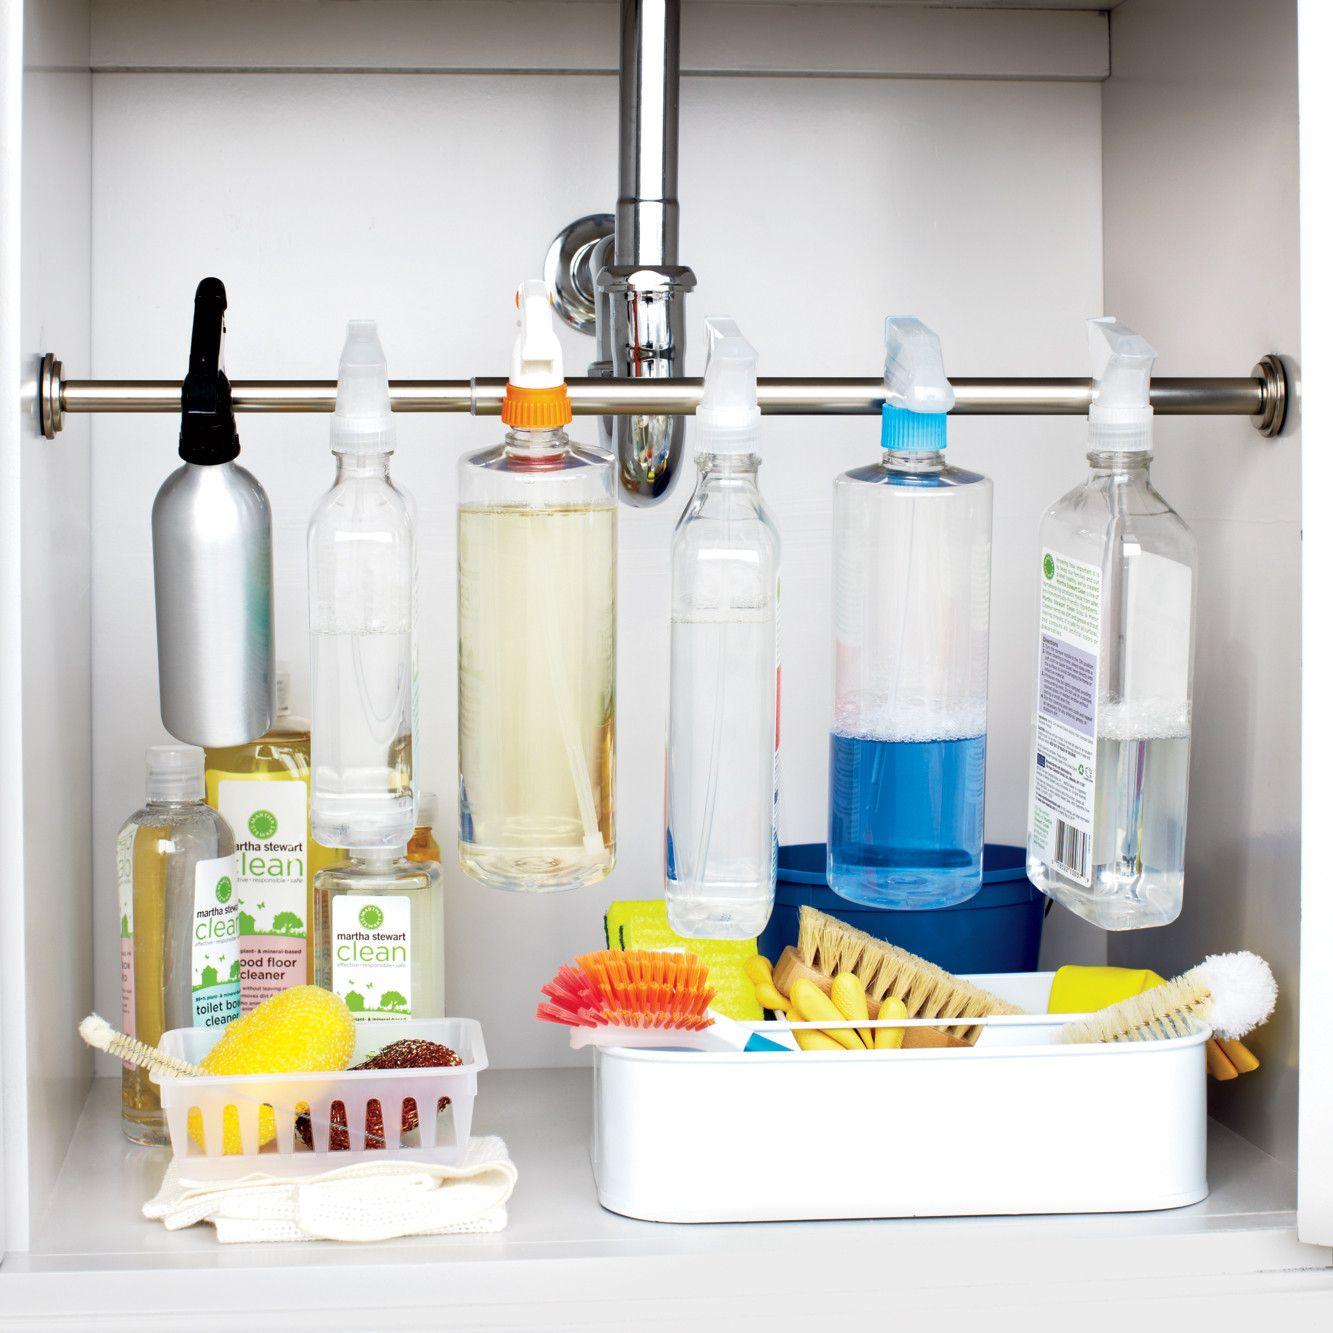 Organizing under your sink mount options kitchen essentials and